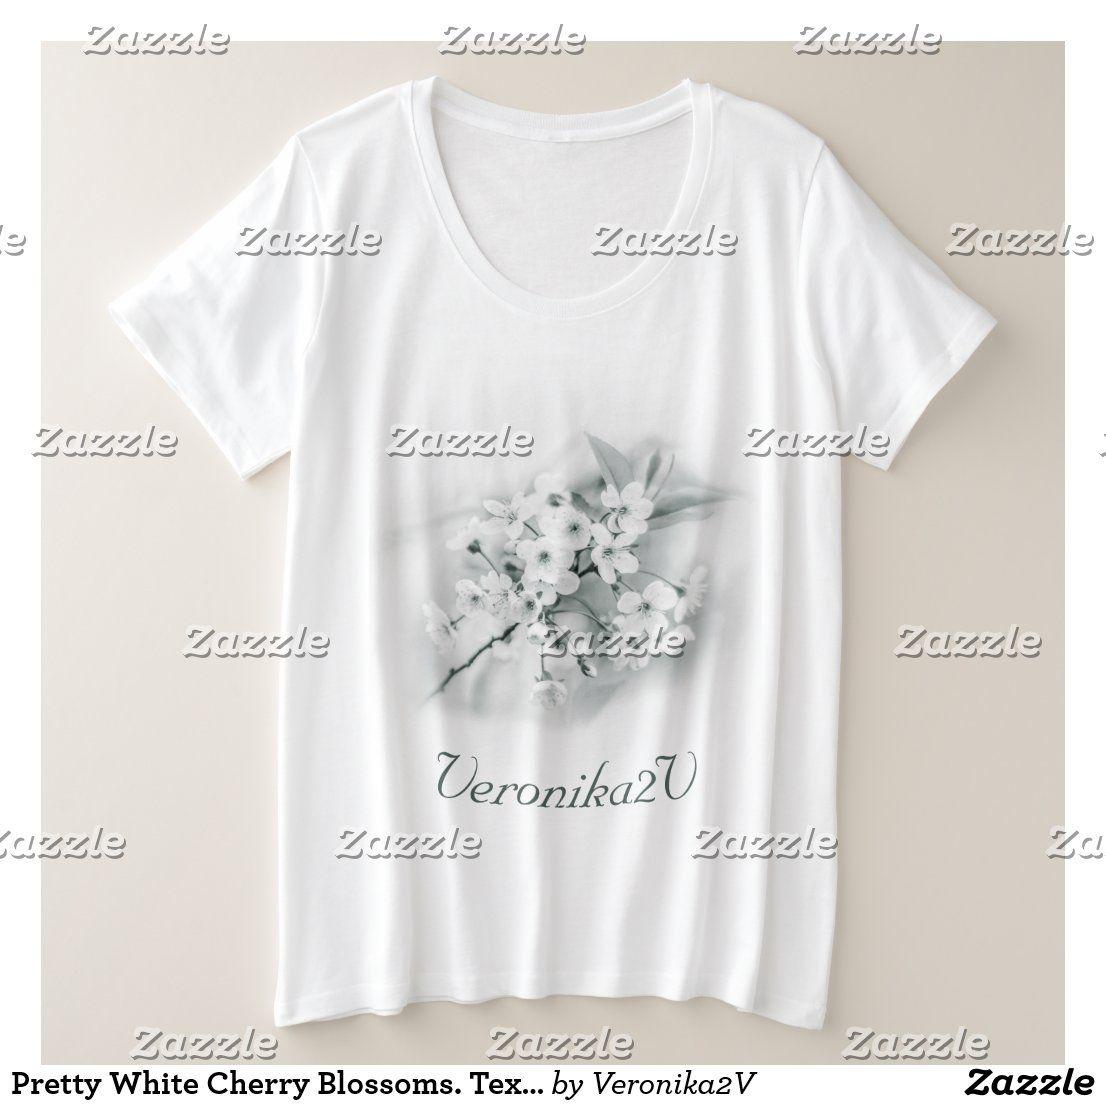 Pretty White Cherry Blossoms Text Template Plus Size T Shirt Zazzle Com In 2021 Plus Size T Shirts White Cherries Shirts [ 1106 x 1106 Pixel ]